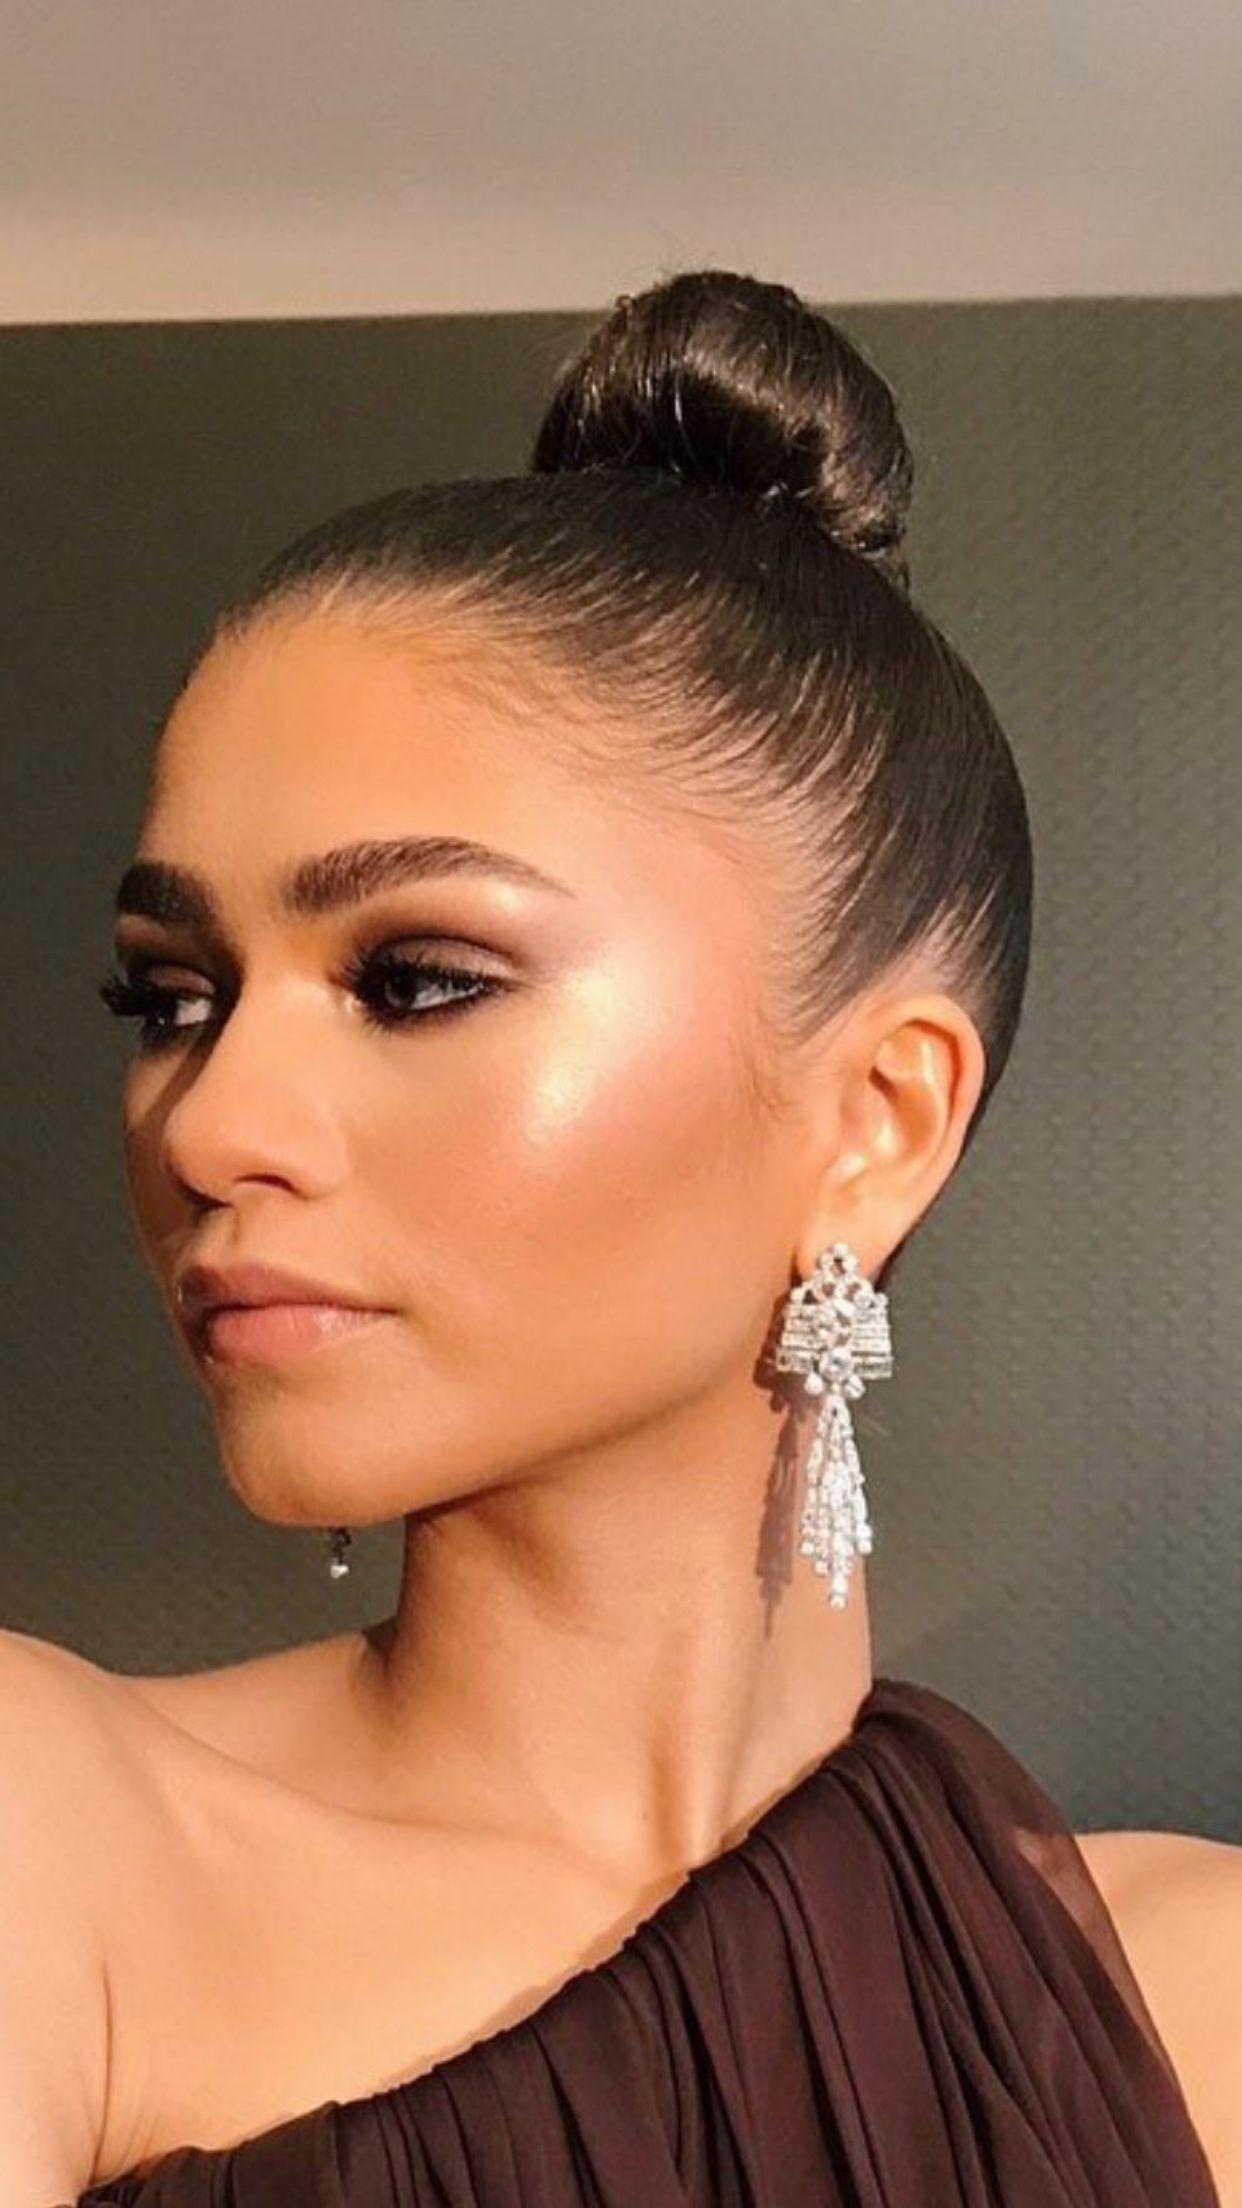 oscars 2018 | slicked hair | pinterest | zendaya, makeup and zendaya